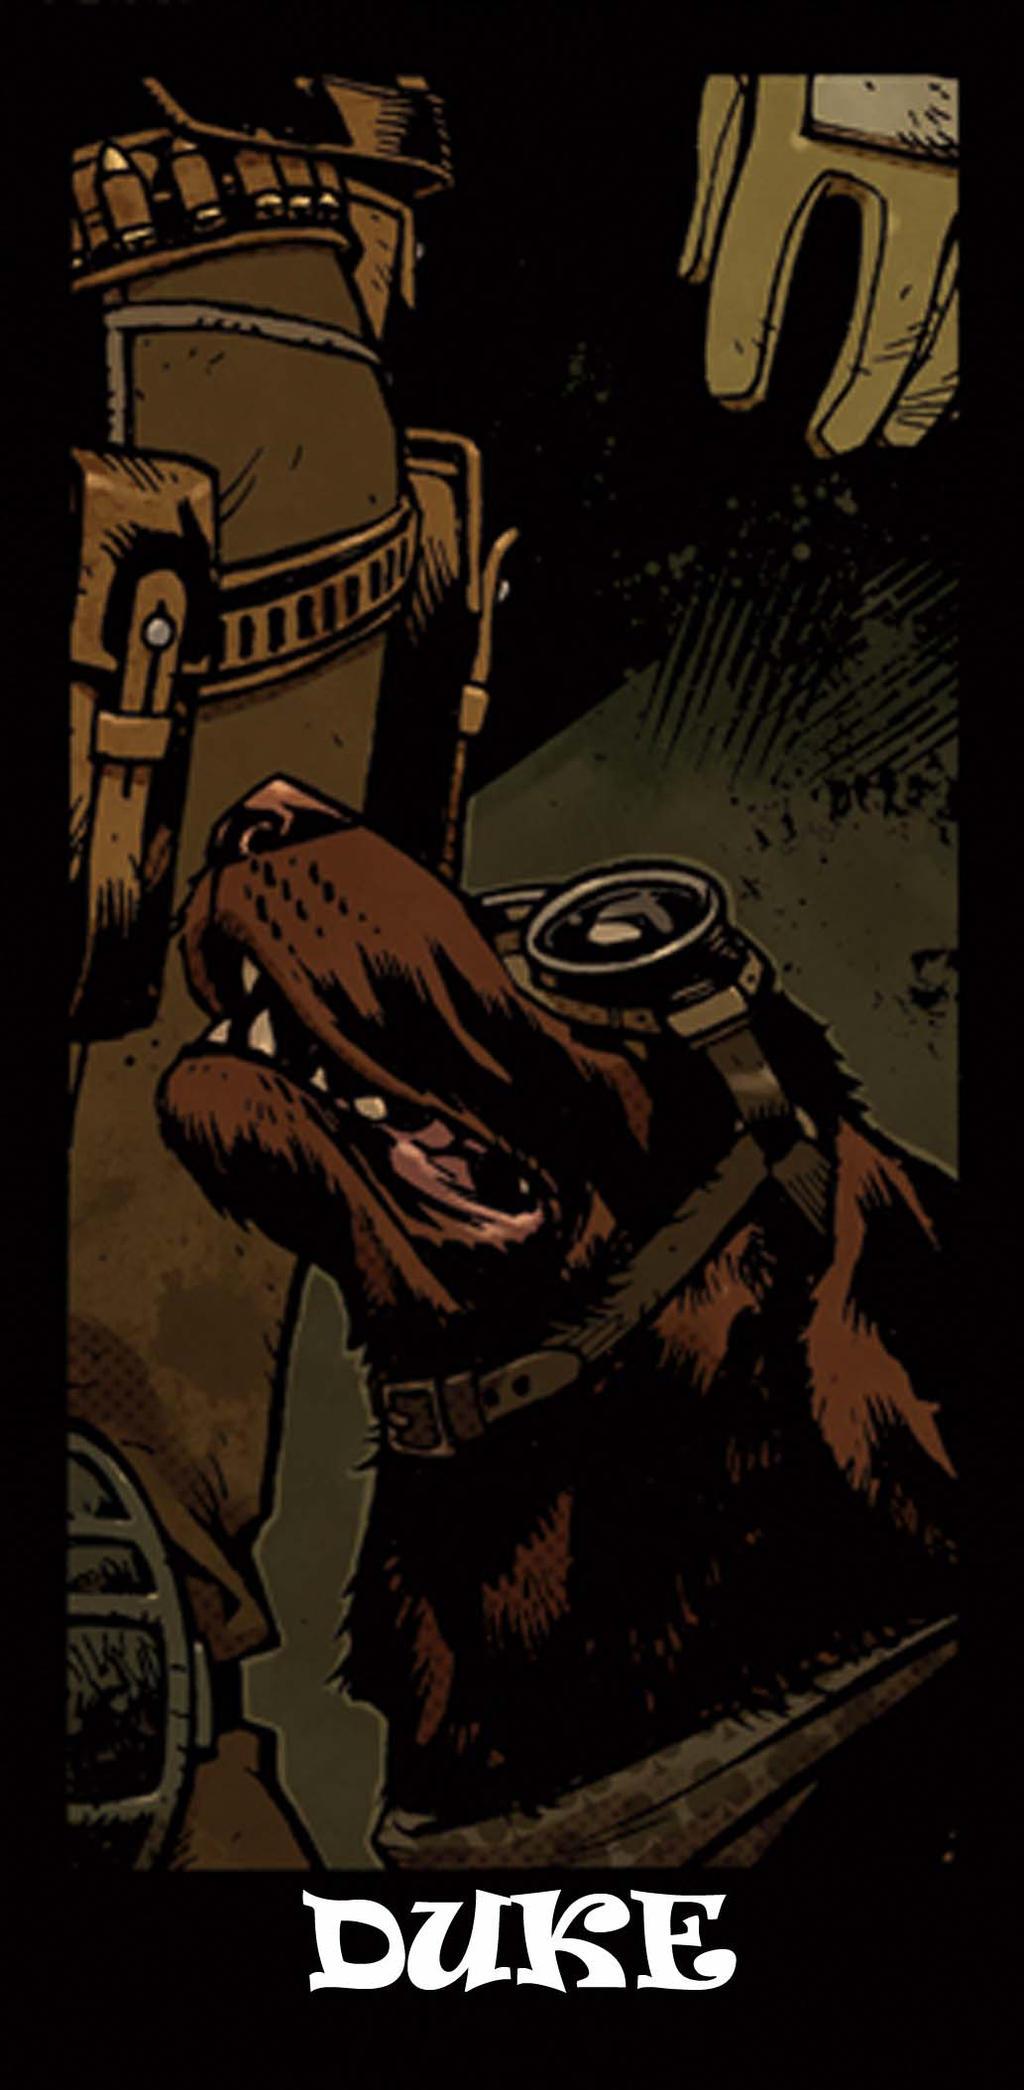 Duke as Critter by Spacefriend-KRUNK